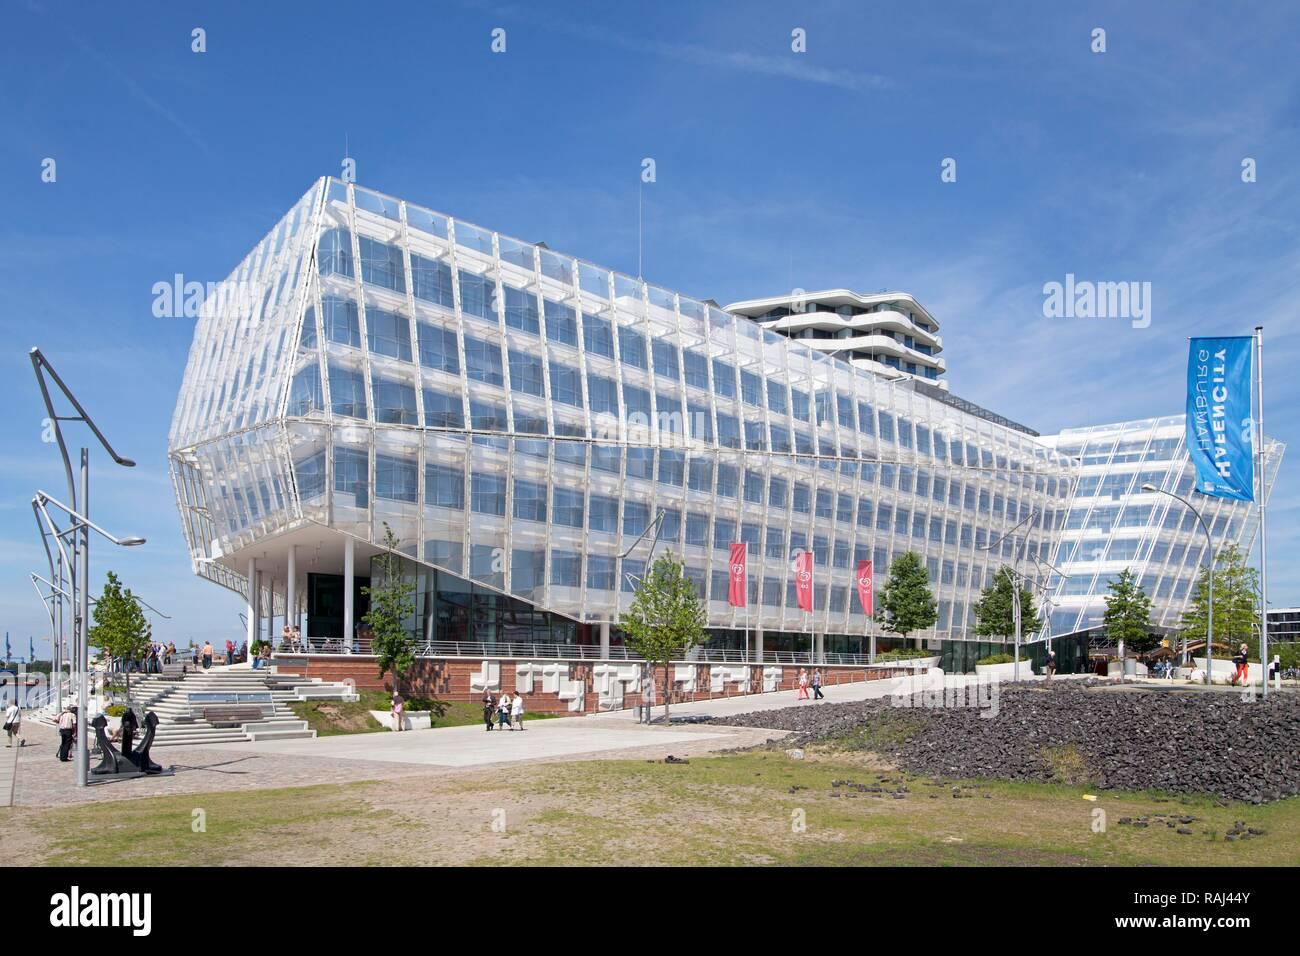 Unilever House and Marco Polo Tower, HafenCity quarter, Hamburg, PublicGround - Stock Image